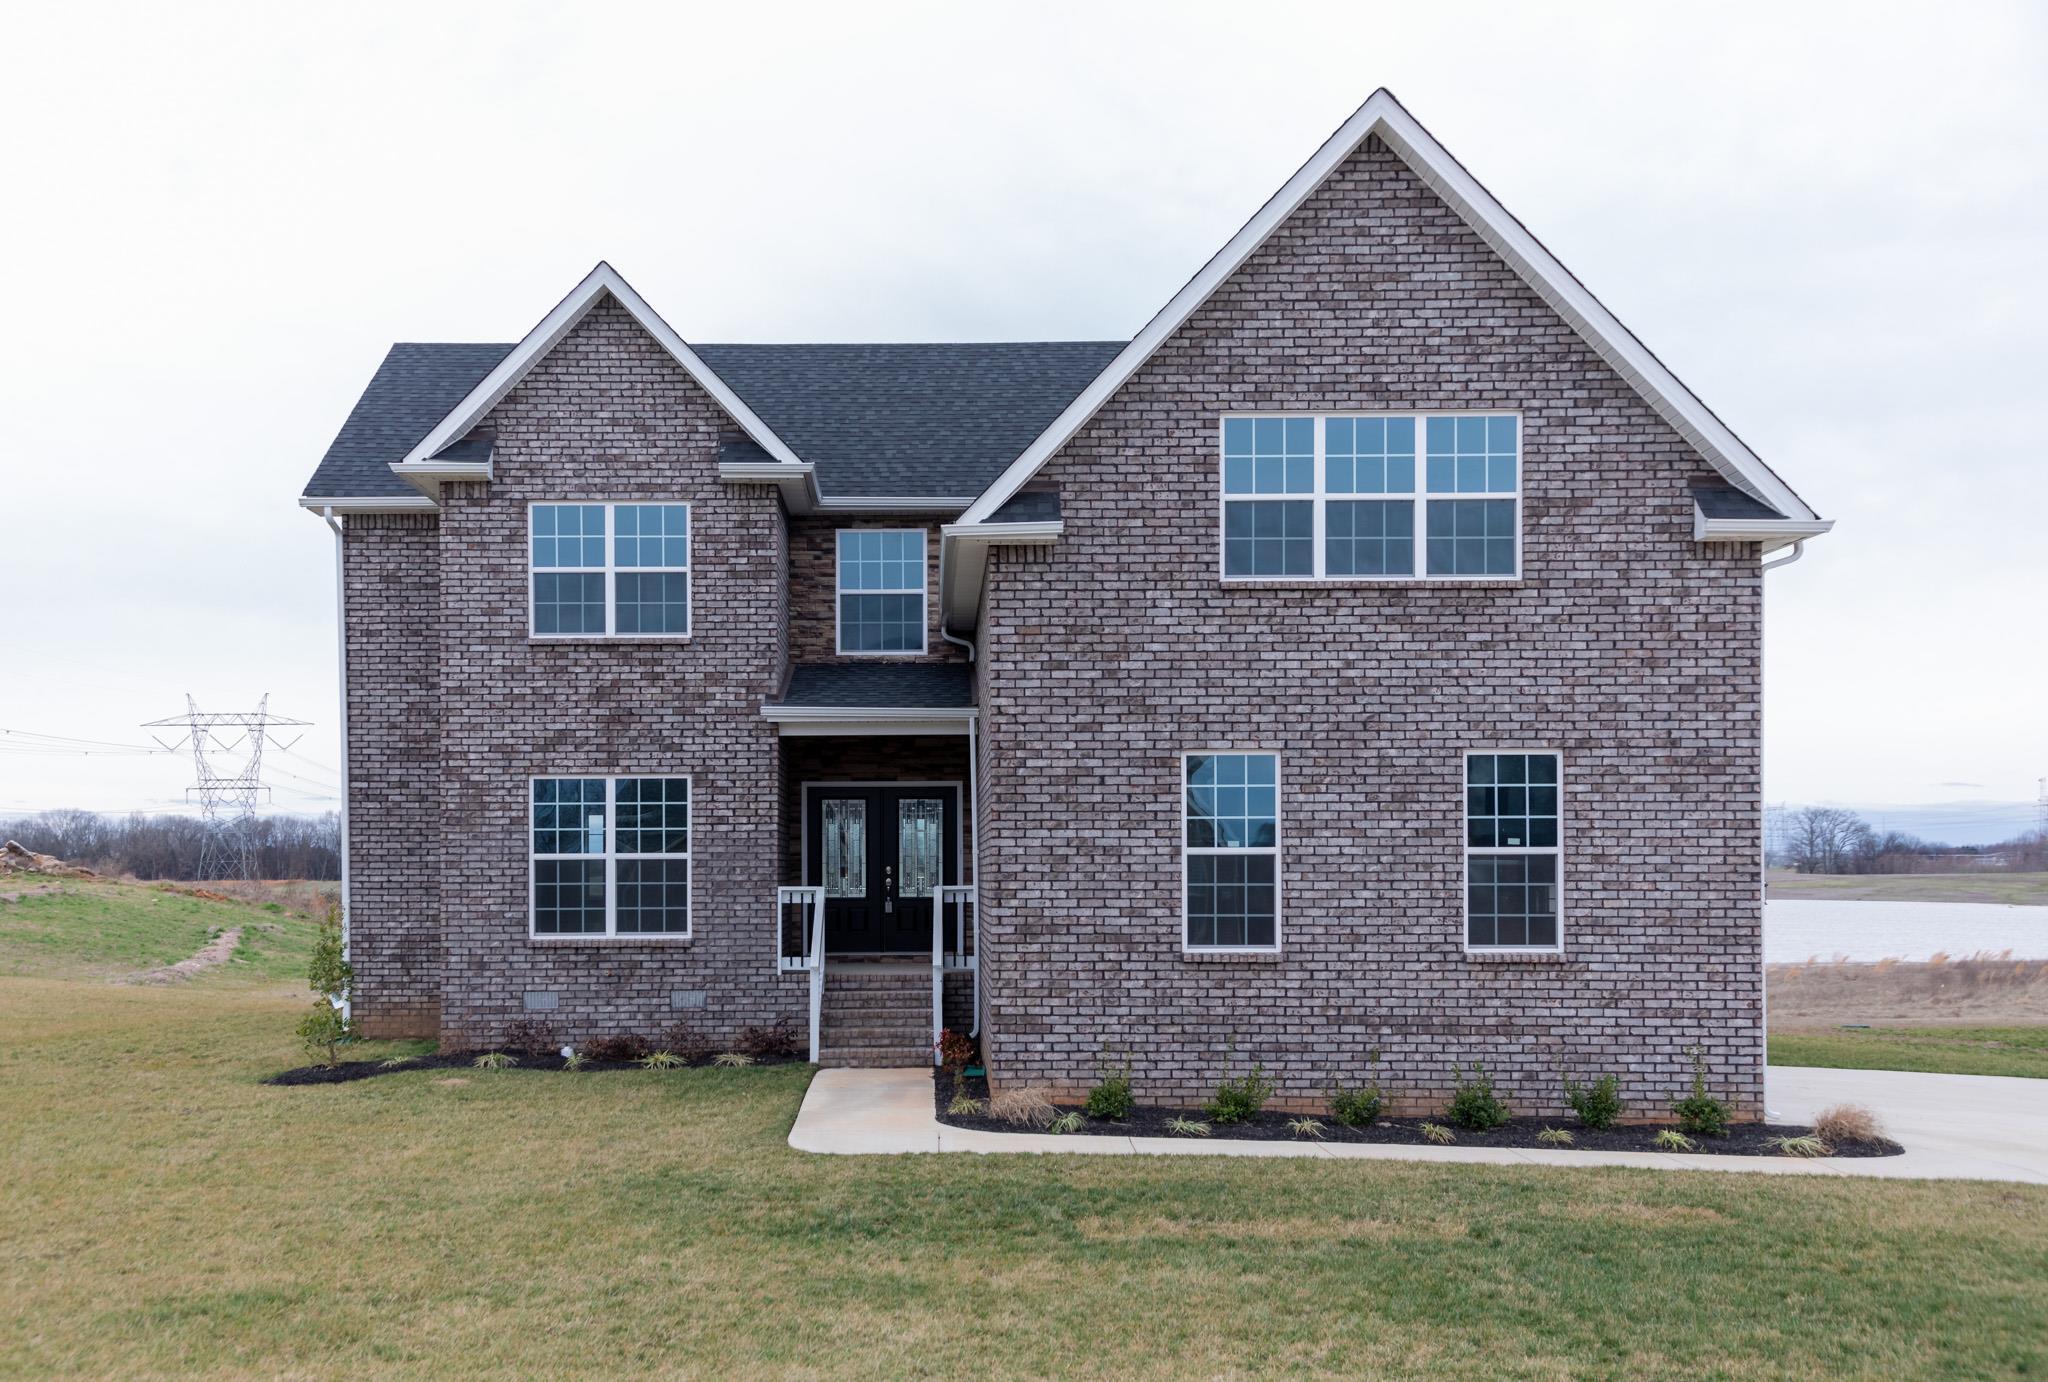 37 Hartley Hills, Clarksville, TN 37043 - Clarksville, TN real estate listing